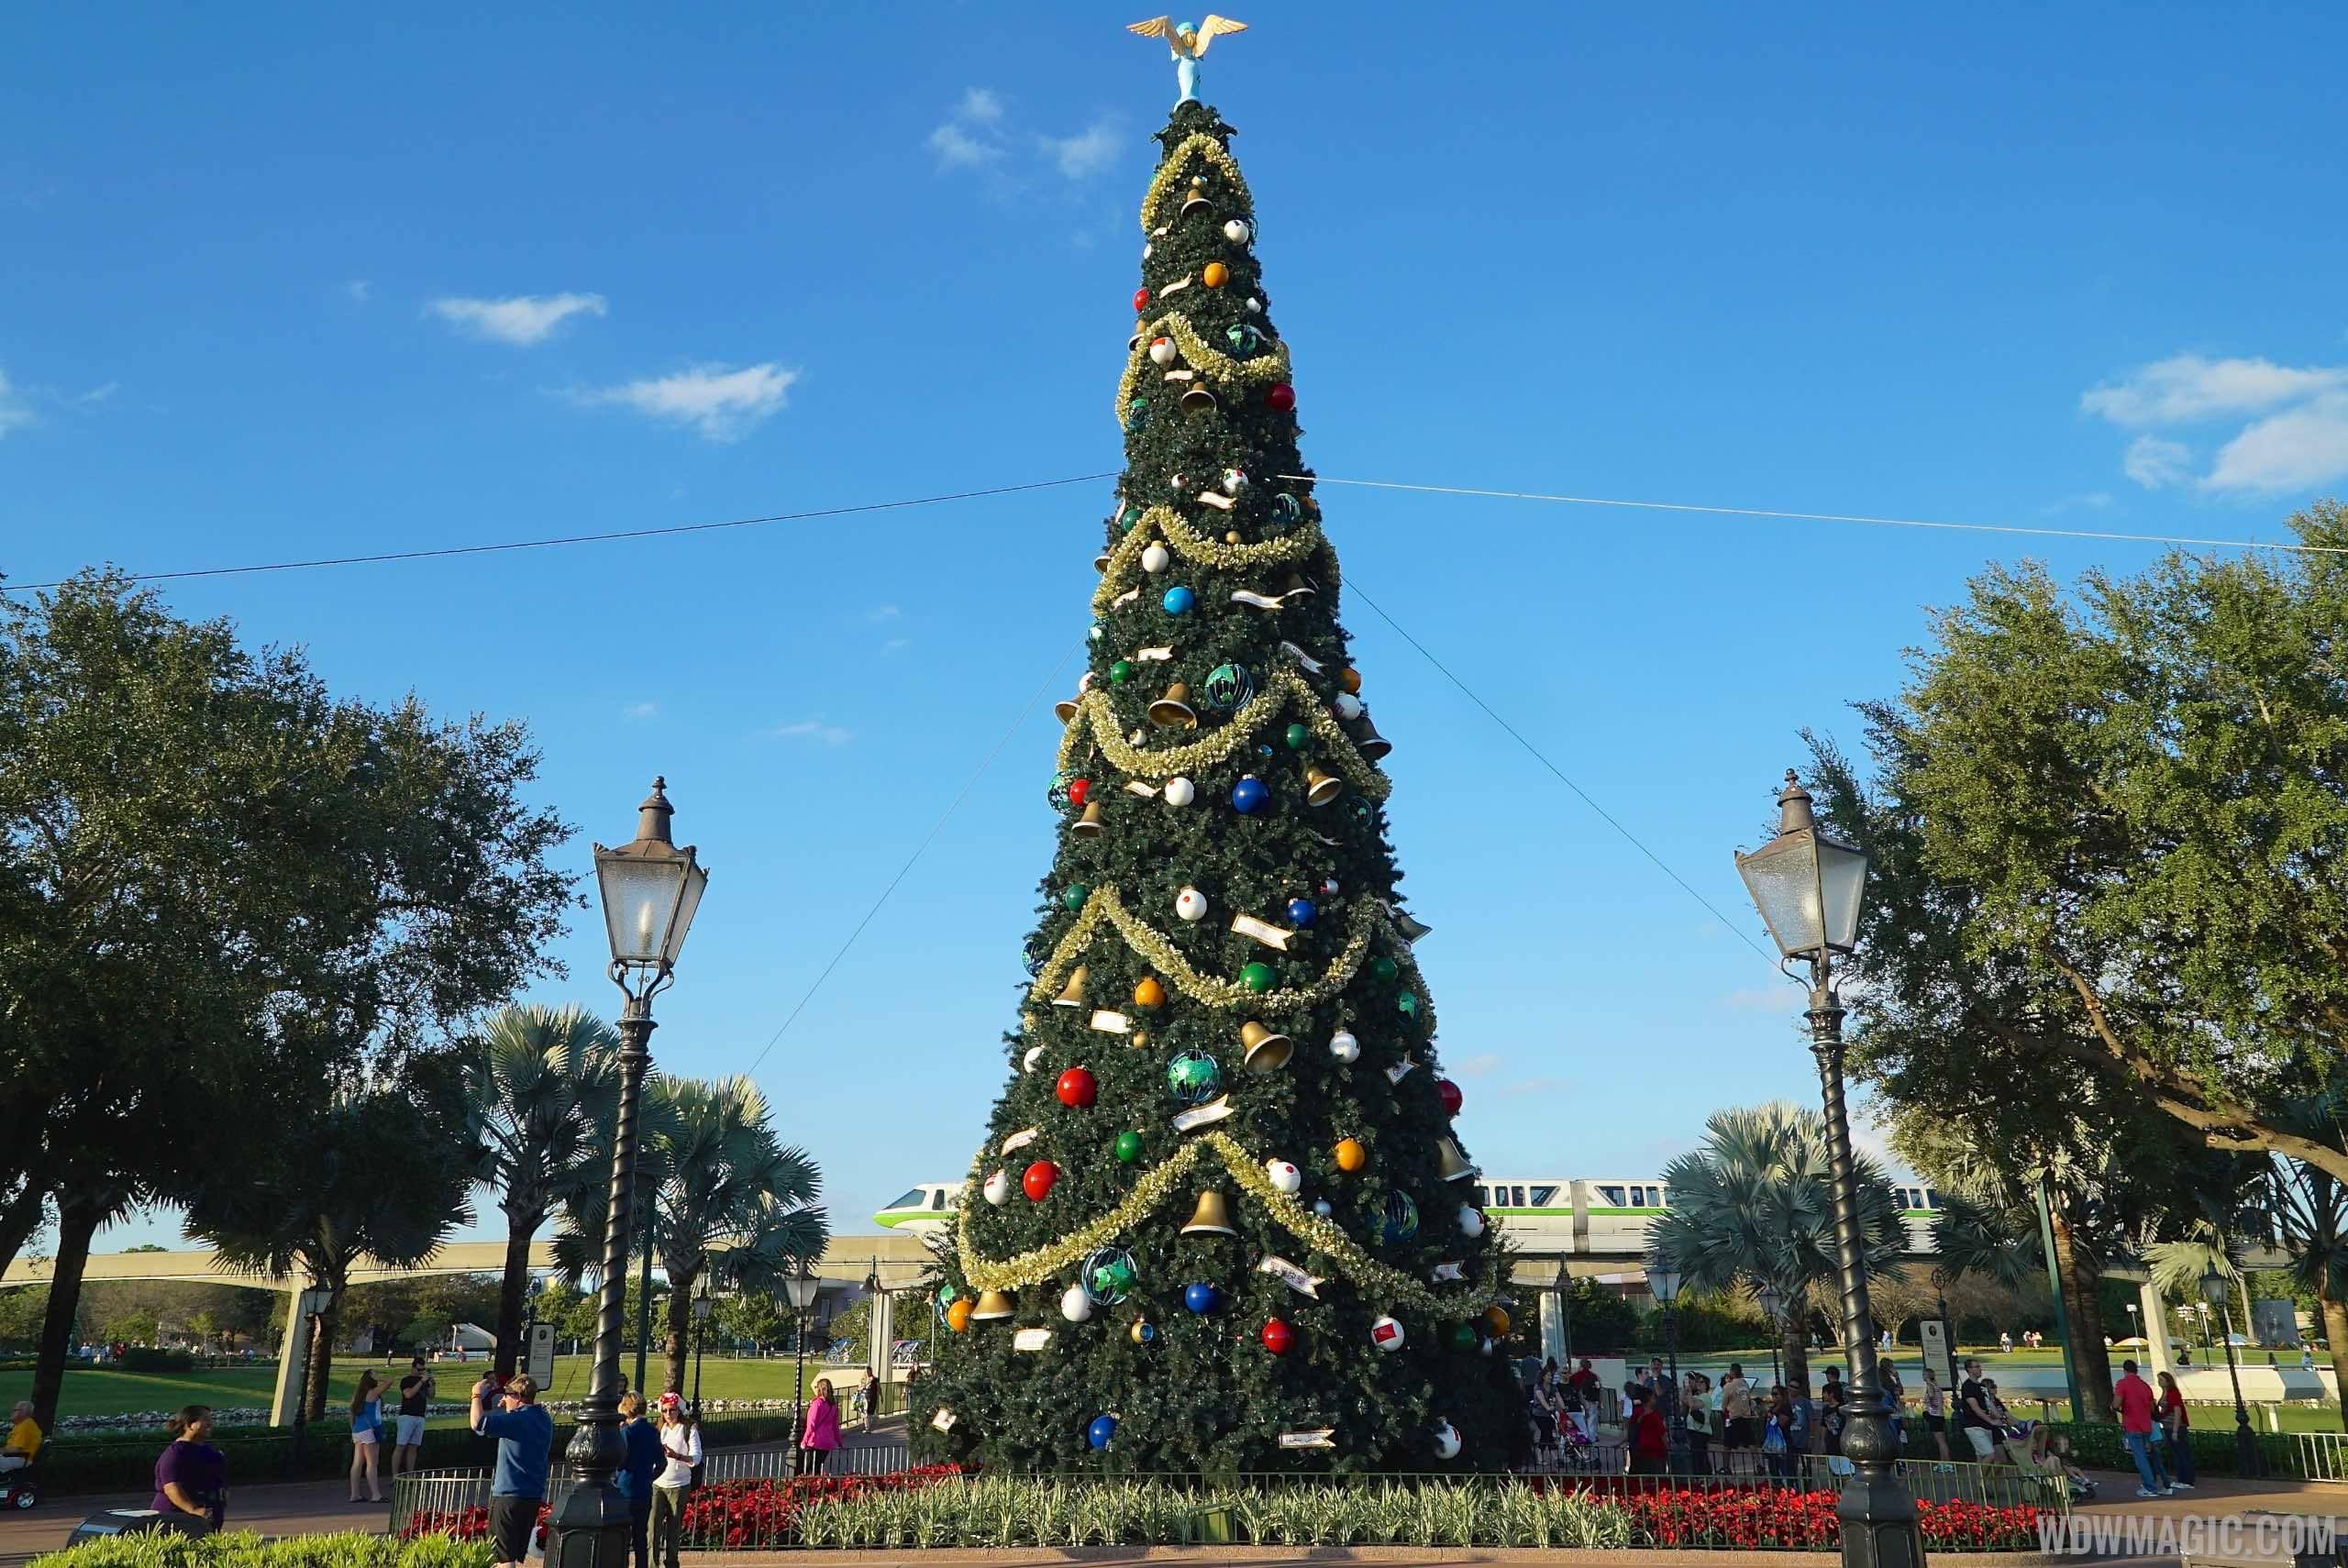 Holidays Around the World overview